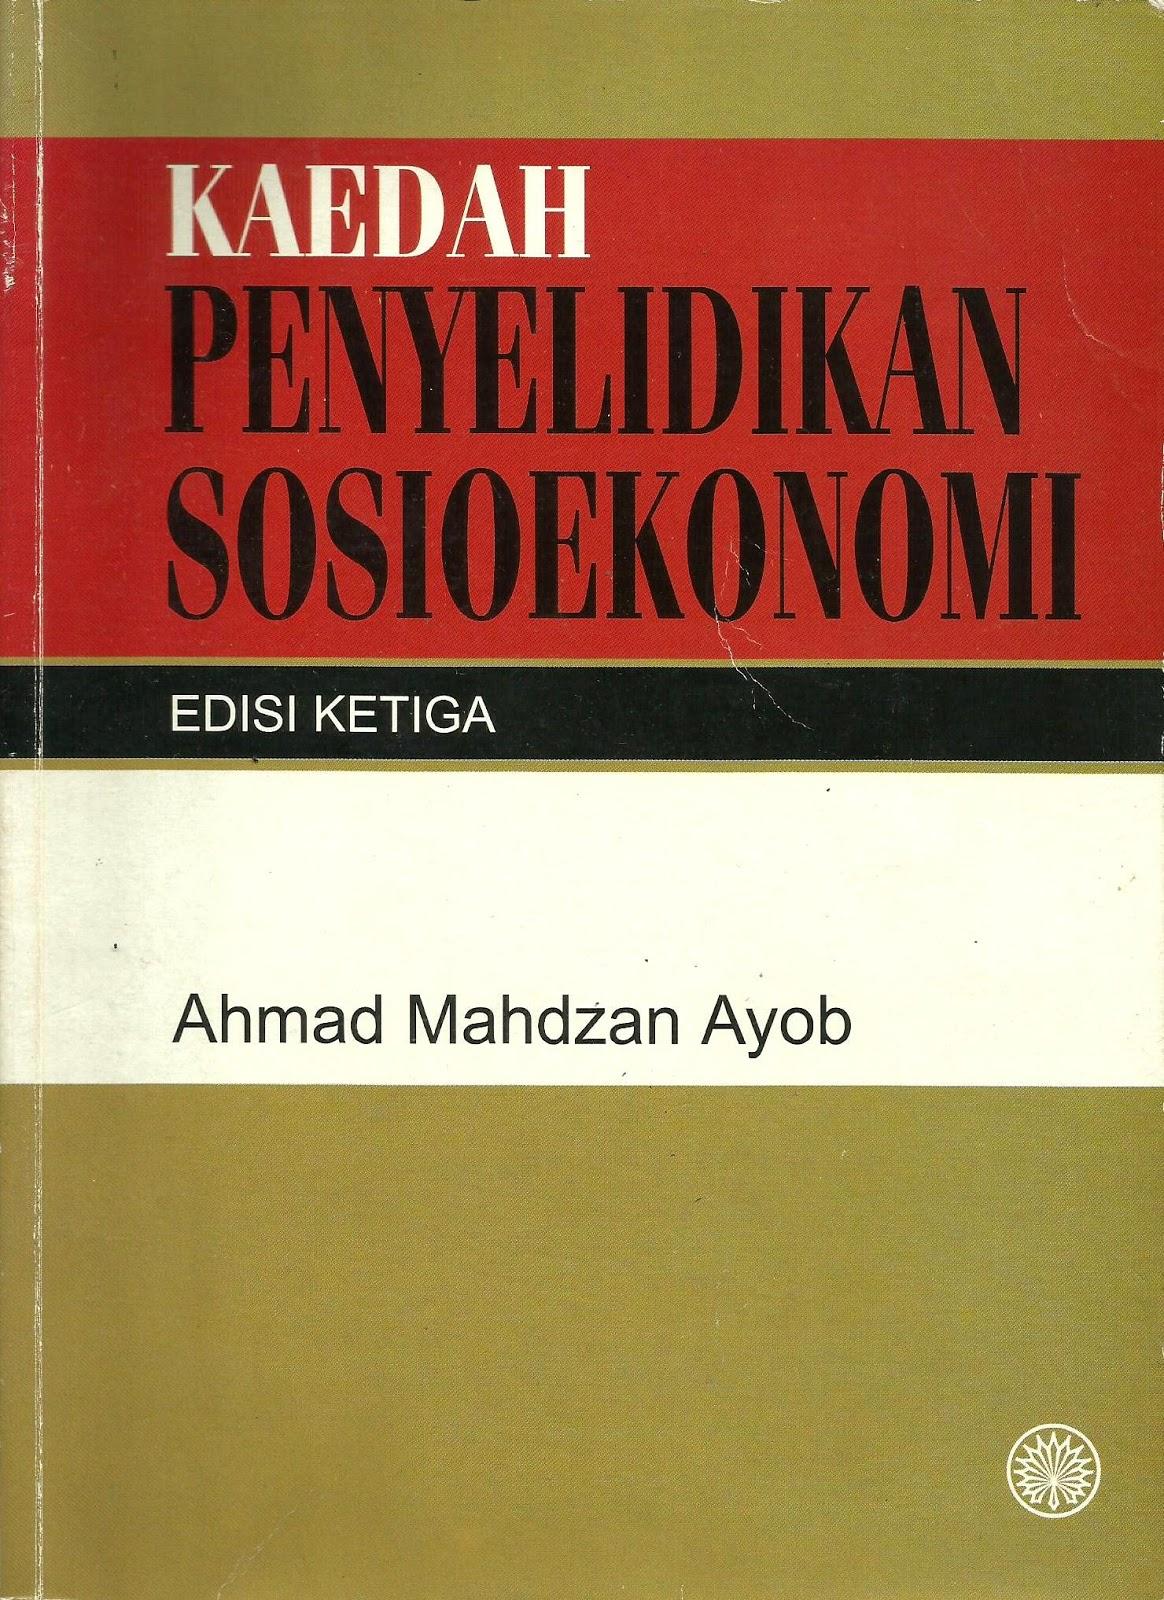 Sosioekonomia